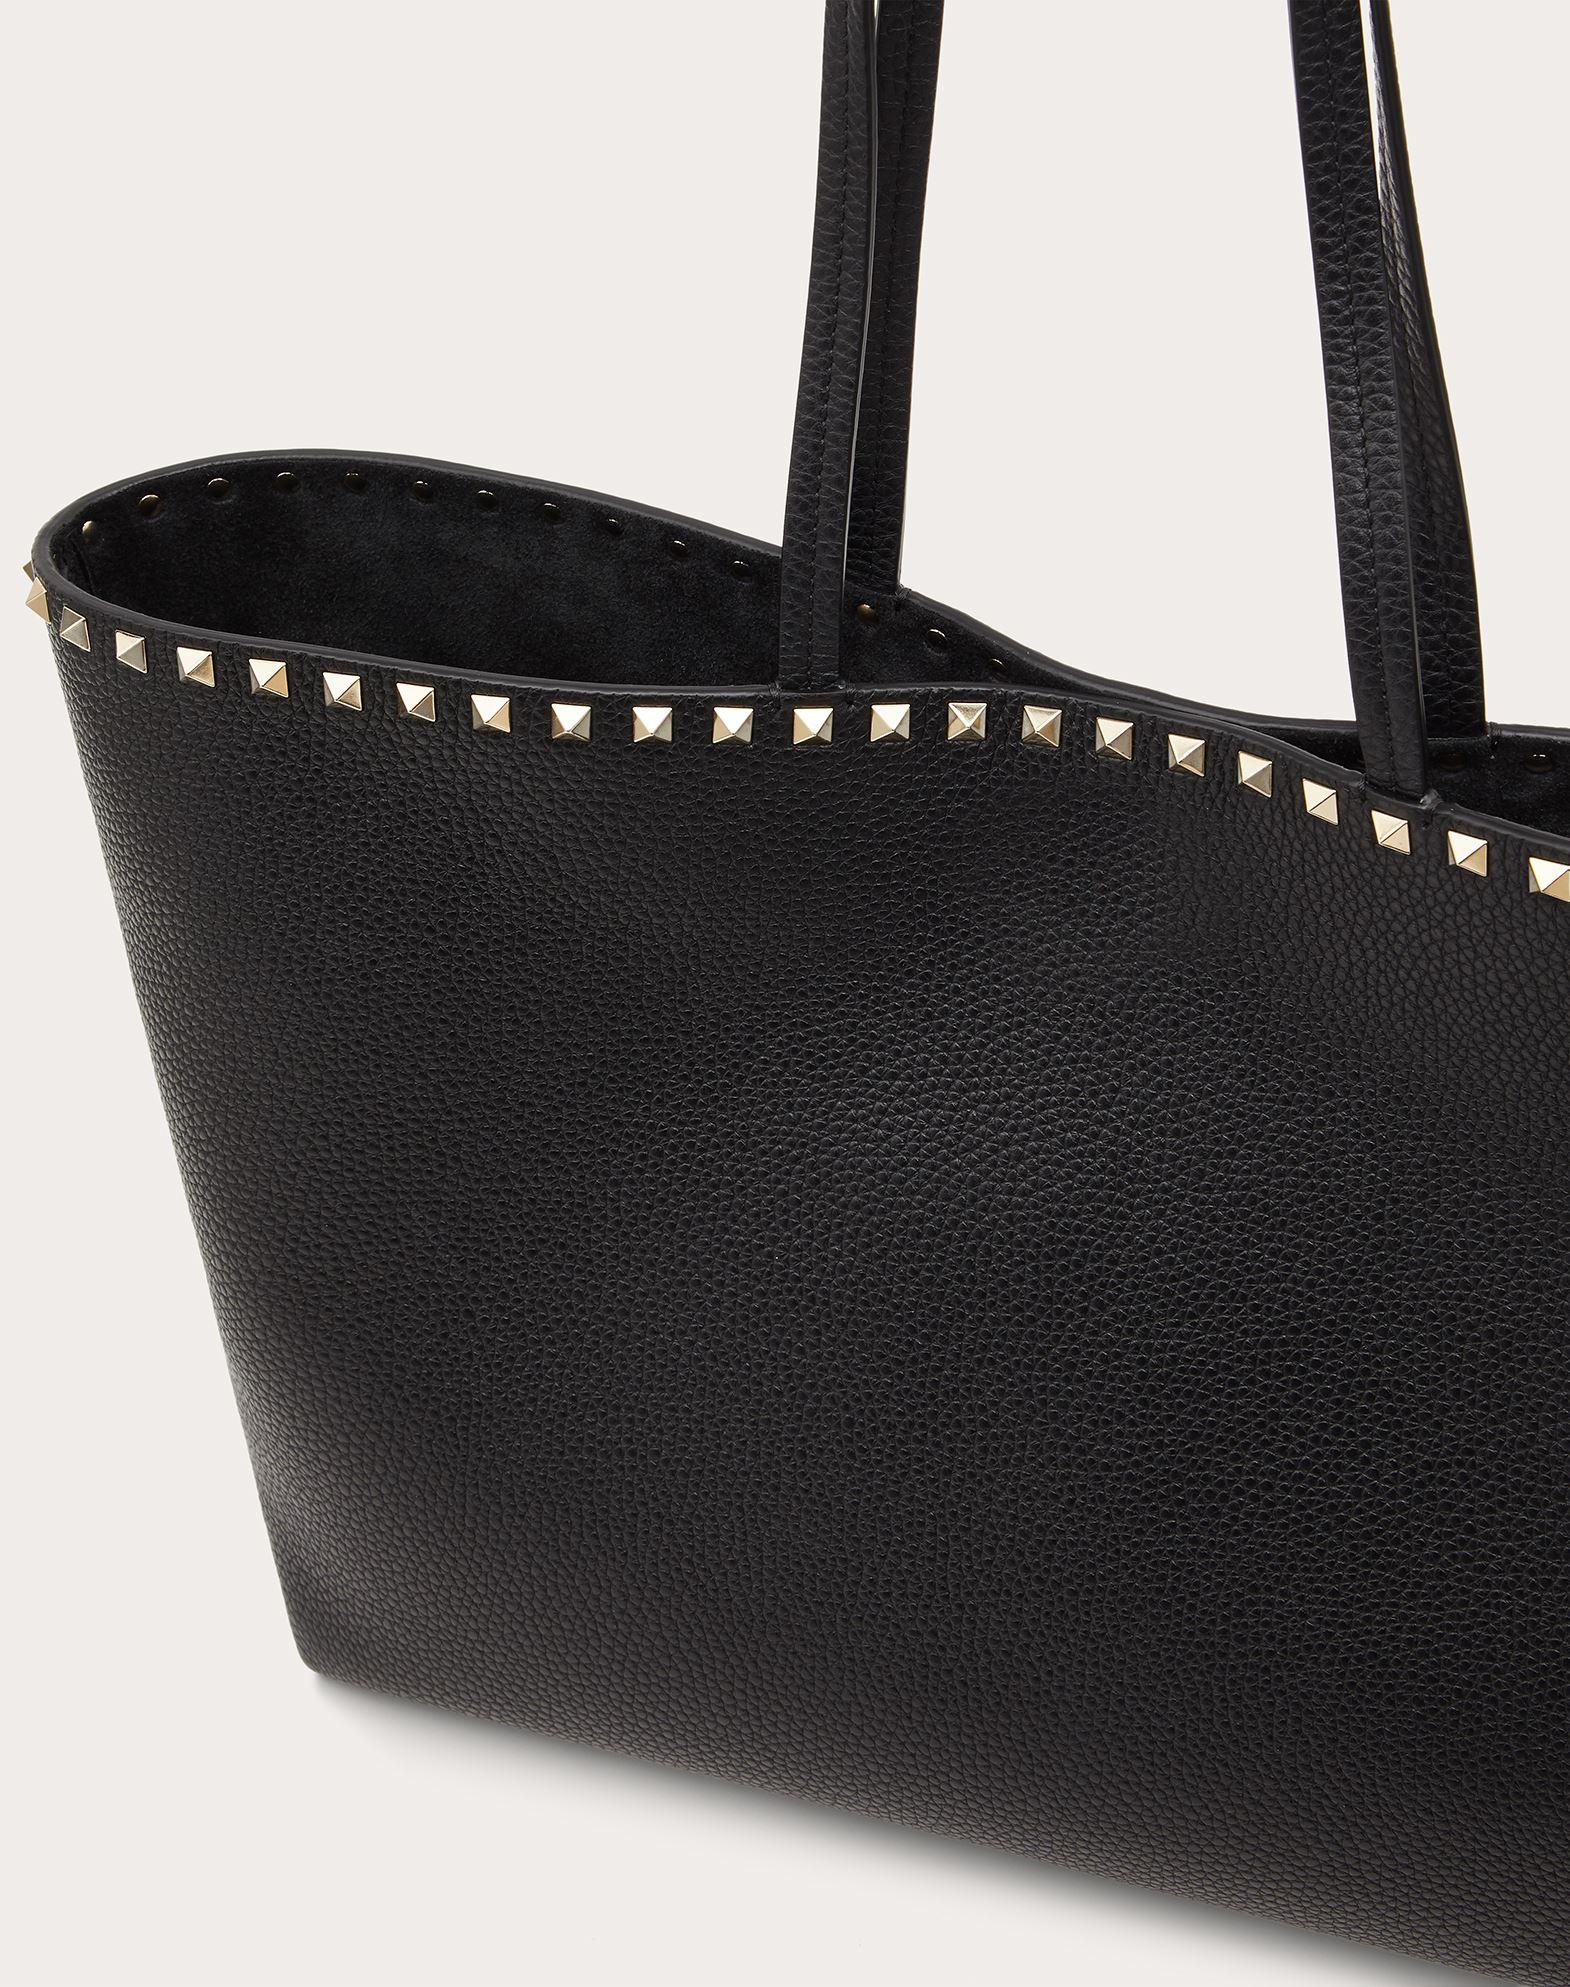 VALENTINO GARAVANI Rockstud 购物袋 Tote 手袋 D a